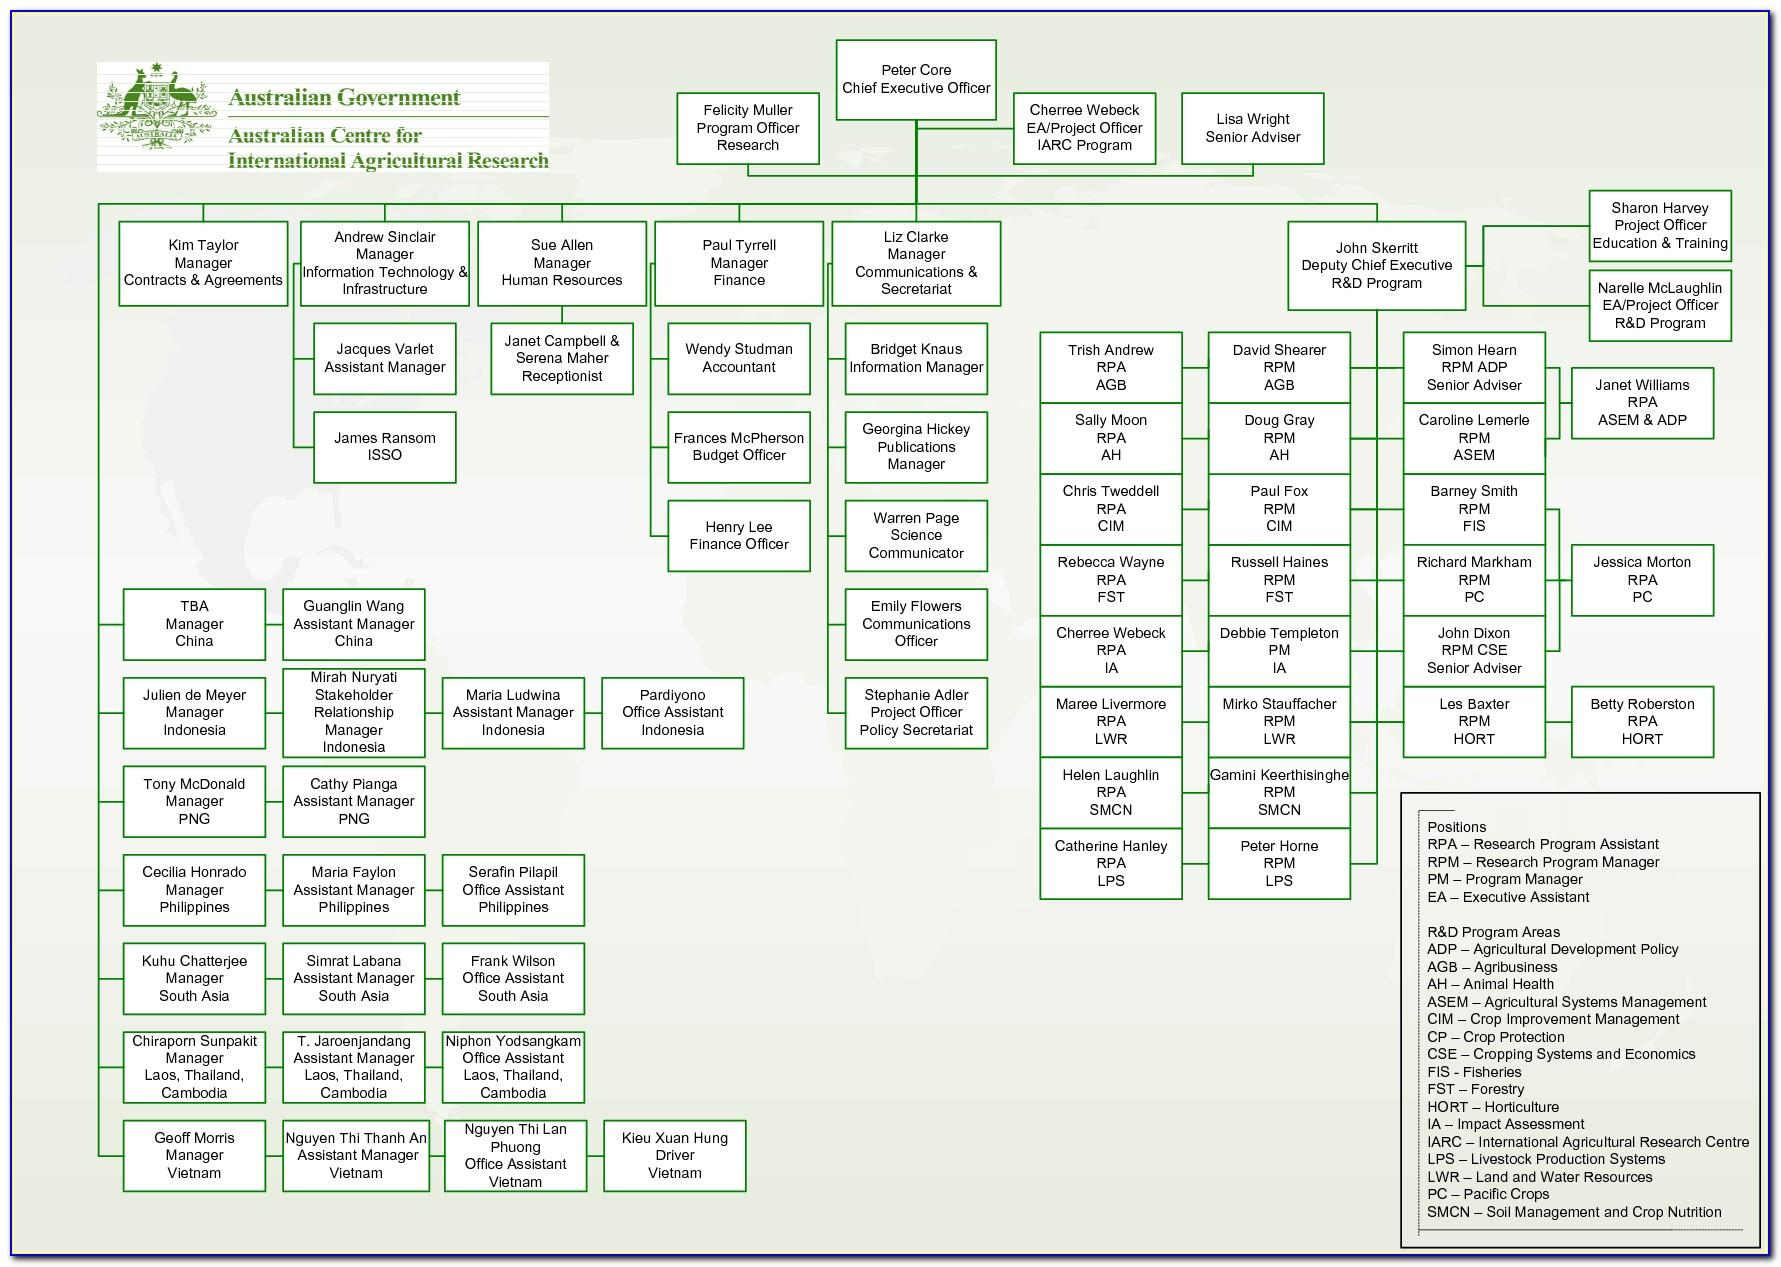 Visio 2016 Organization Chart Template